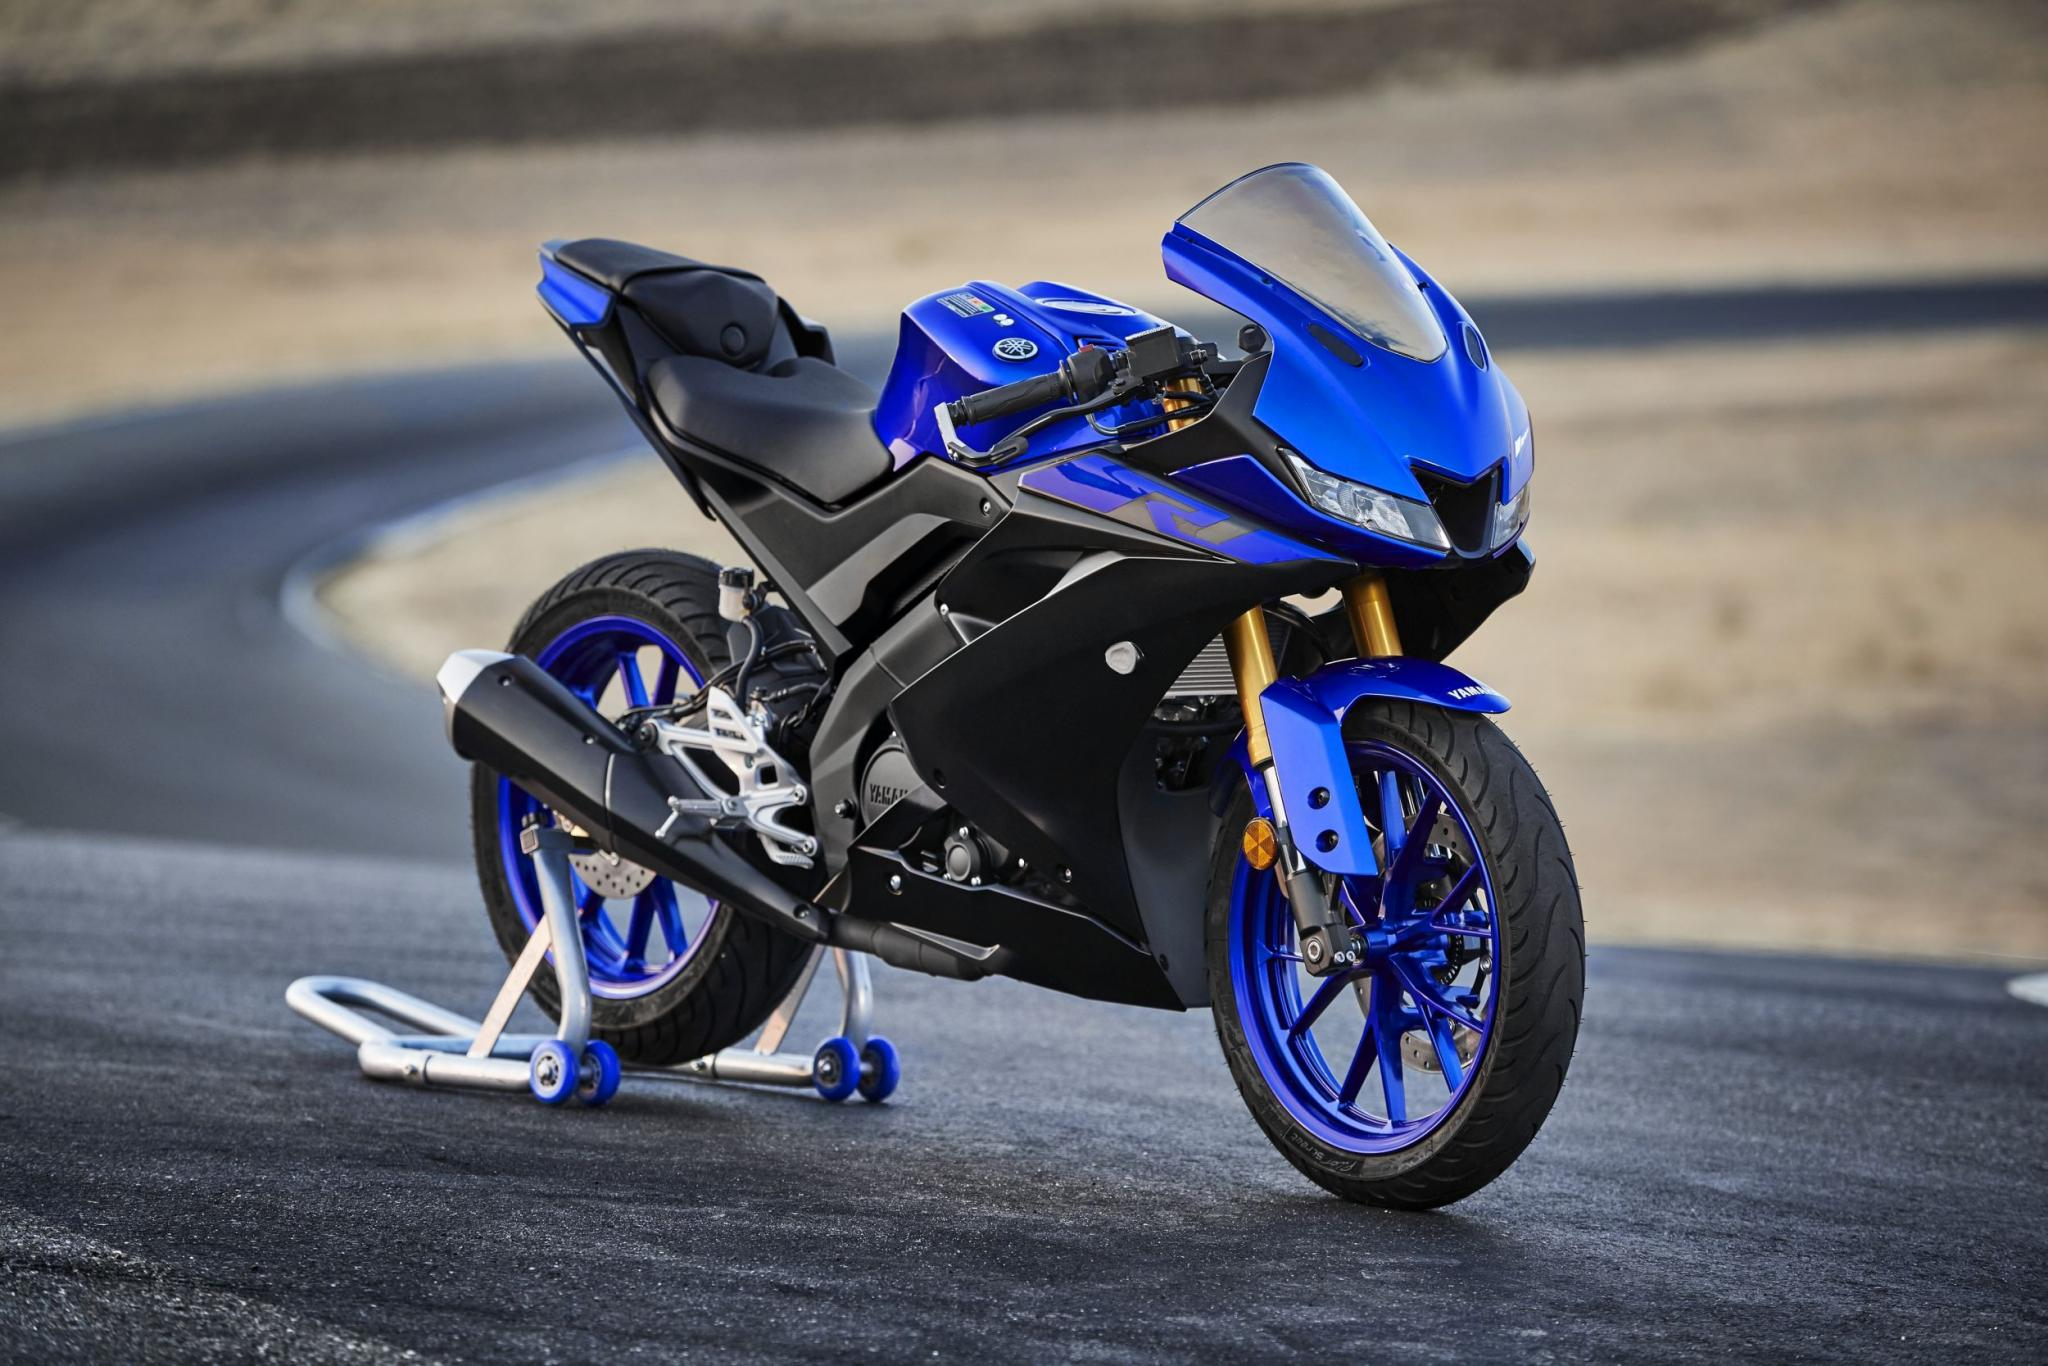 Yamaha Yzf R125 2019 Alle Bilder Vom A1 Supersportler Modellnews